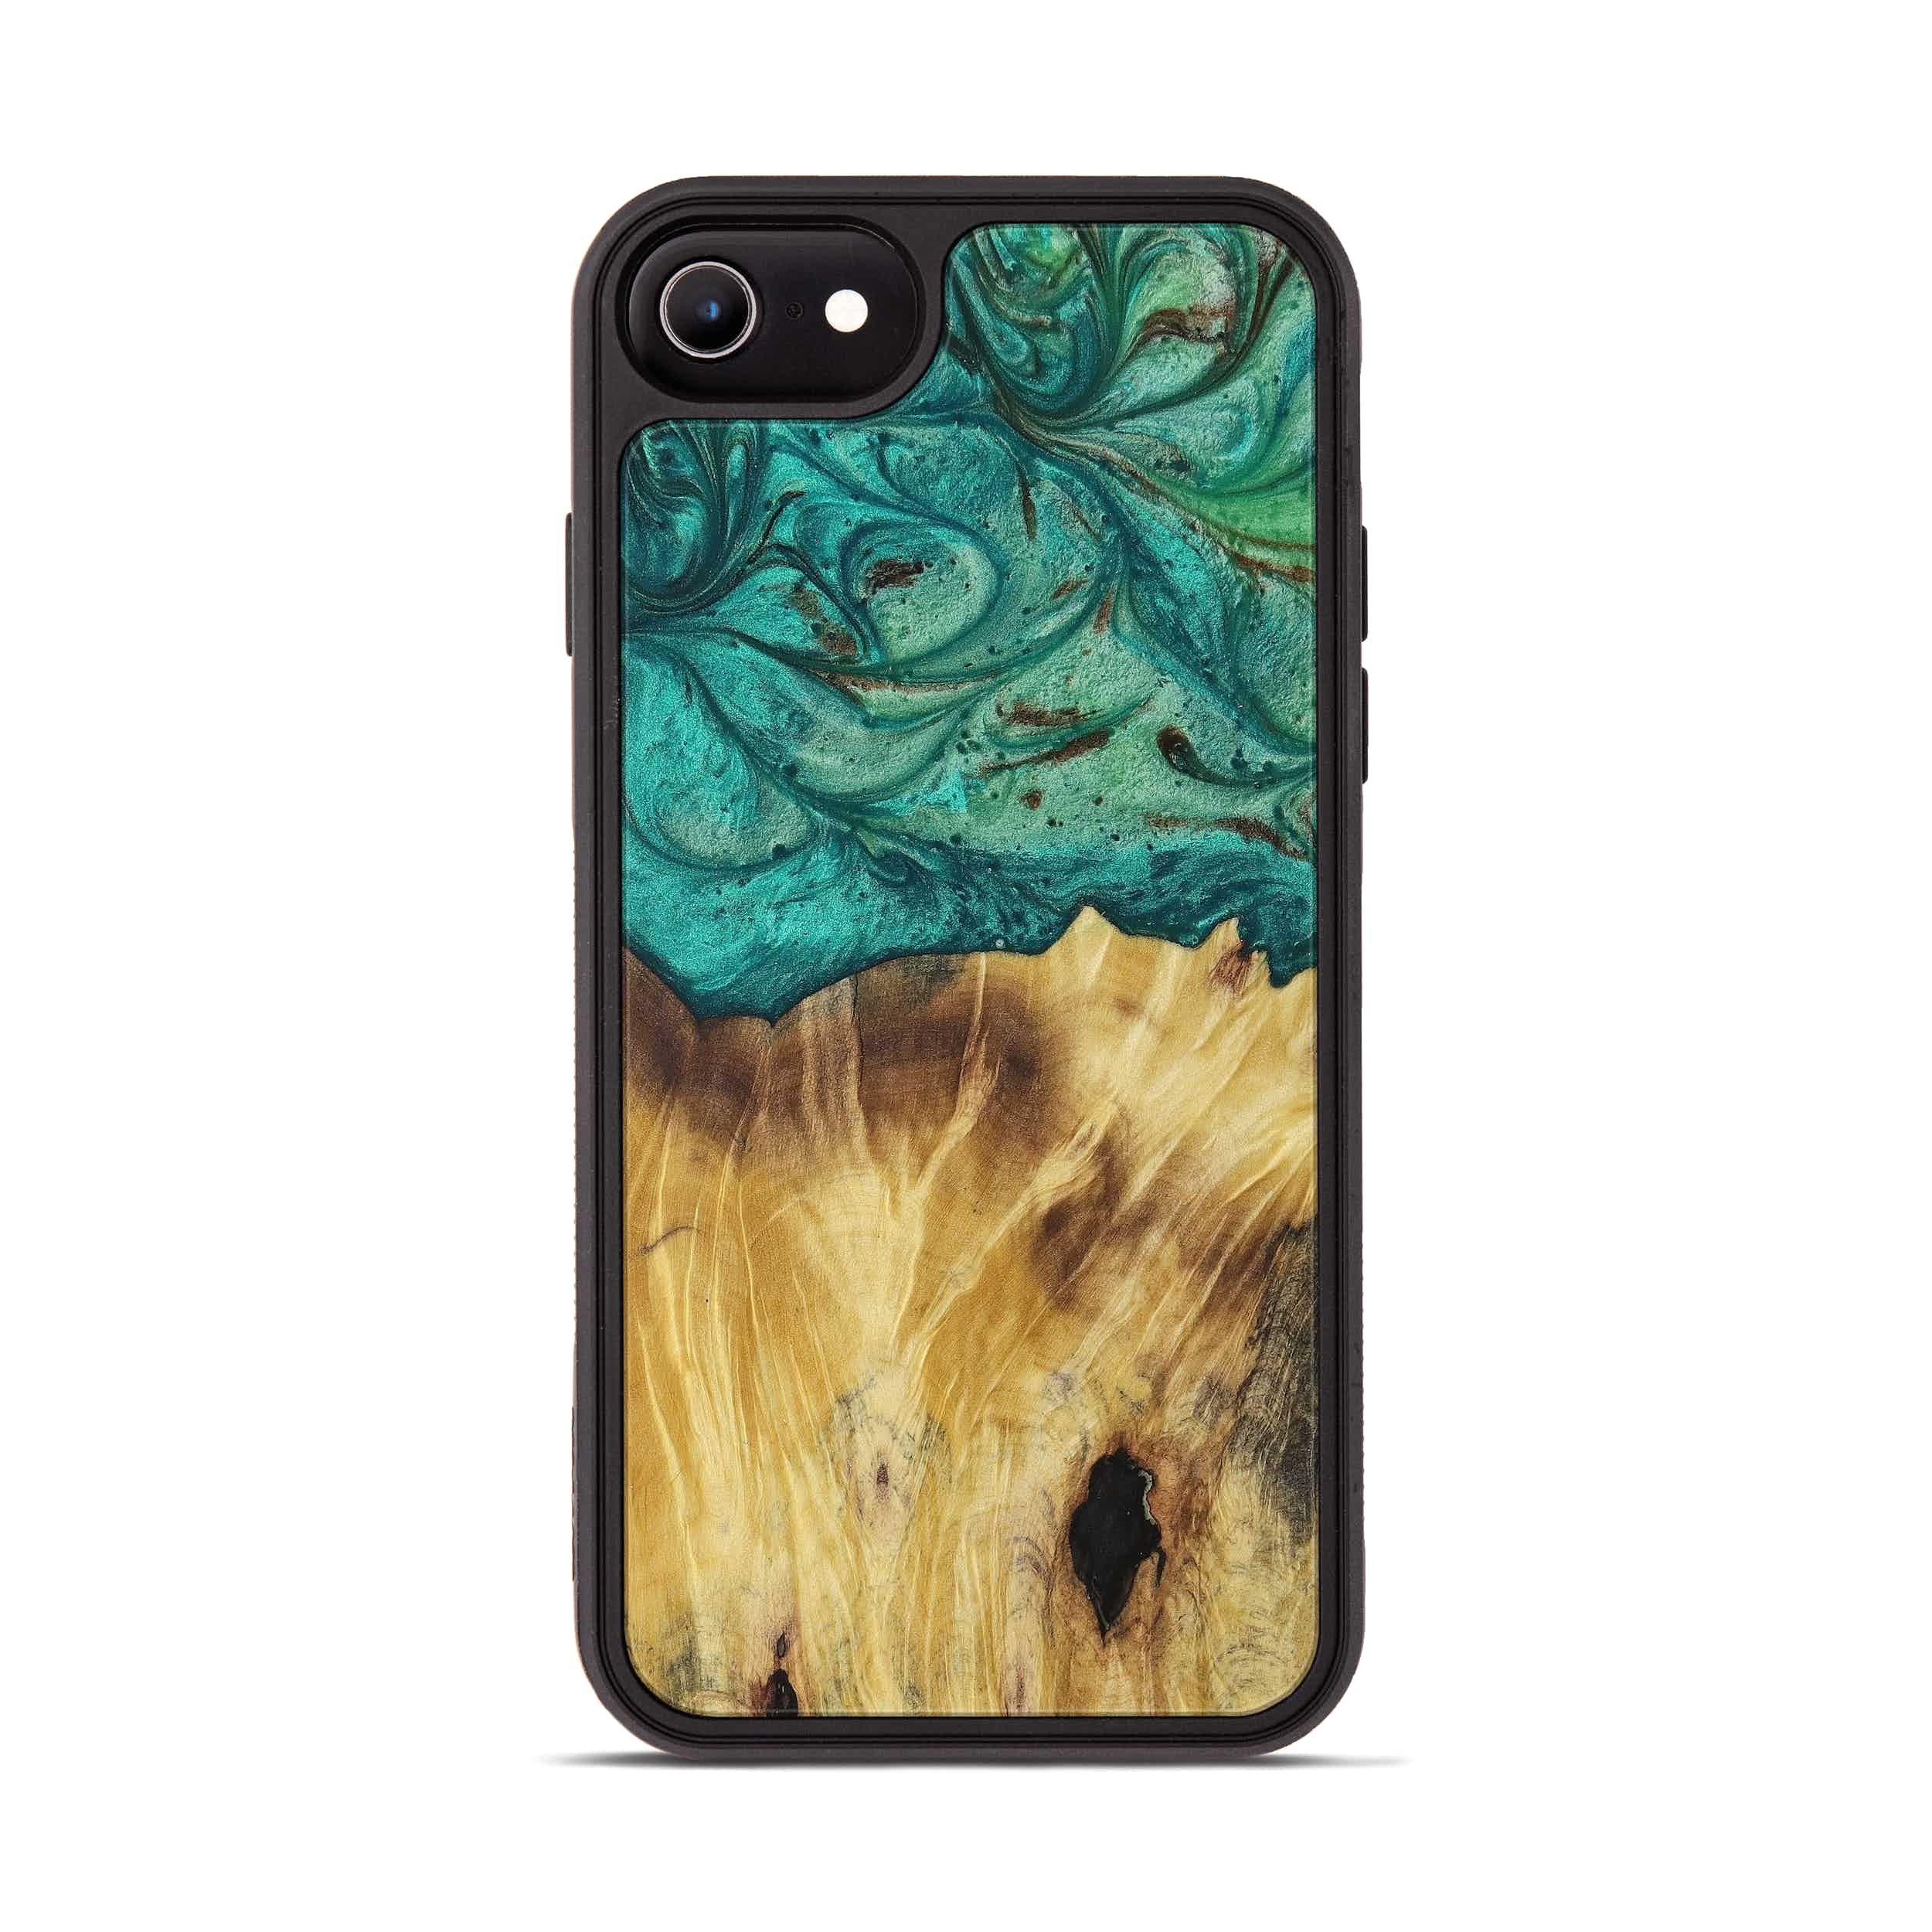 iPhone 6s Wood+Resin Phone Case - Tom (Dark Green, 397789)